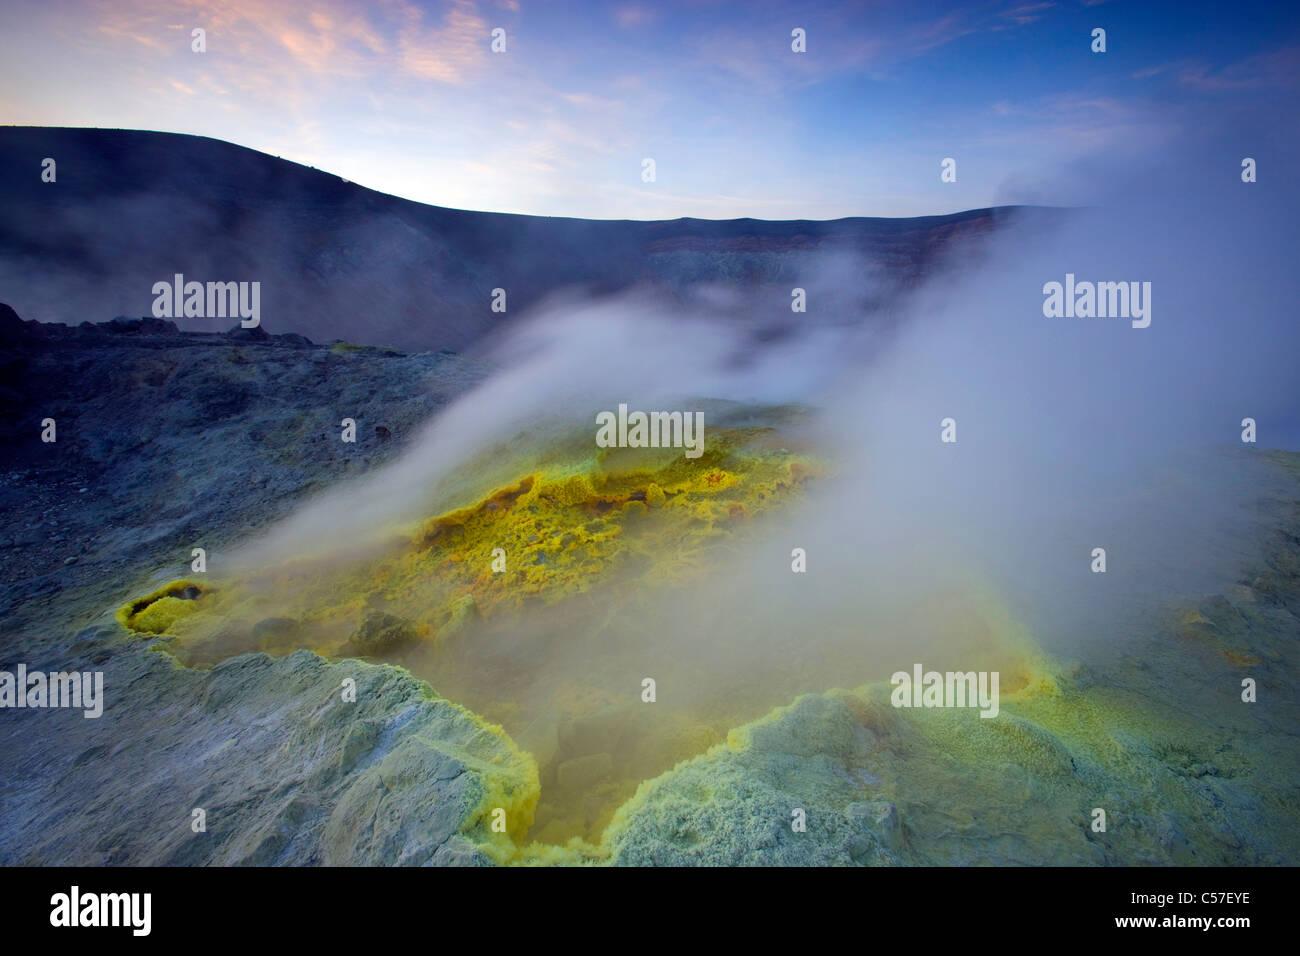 Vulcano, Italien, Europa, Liparischen Inseln, Insel, Insel, Vulkan, Krater, Fumarole, Schwefel, Schwefel, Ablagerung, Stockbild